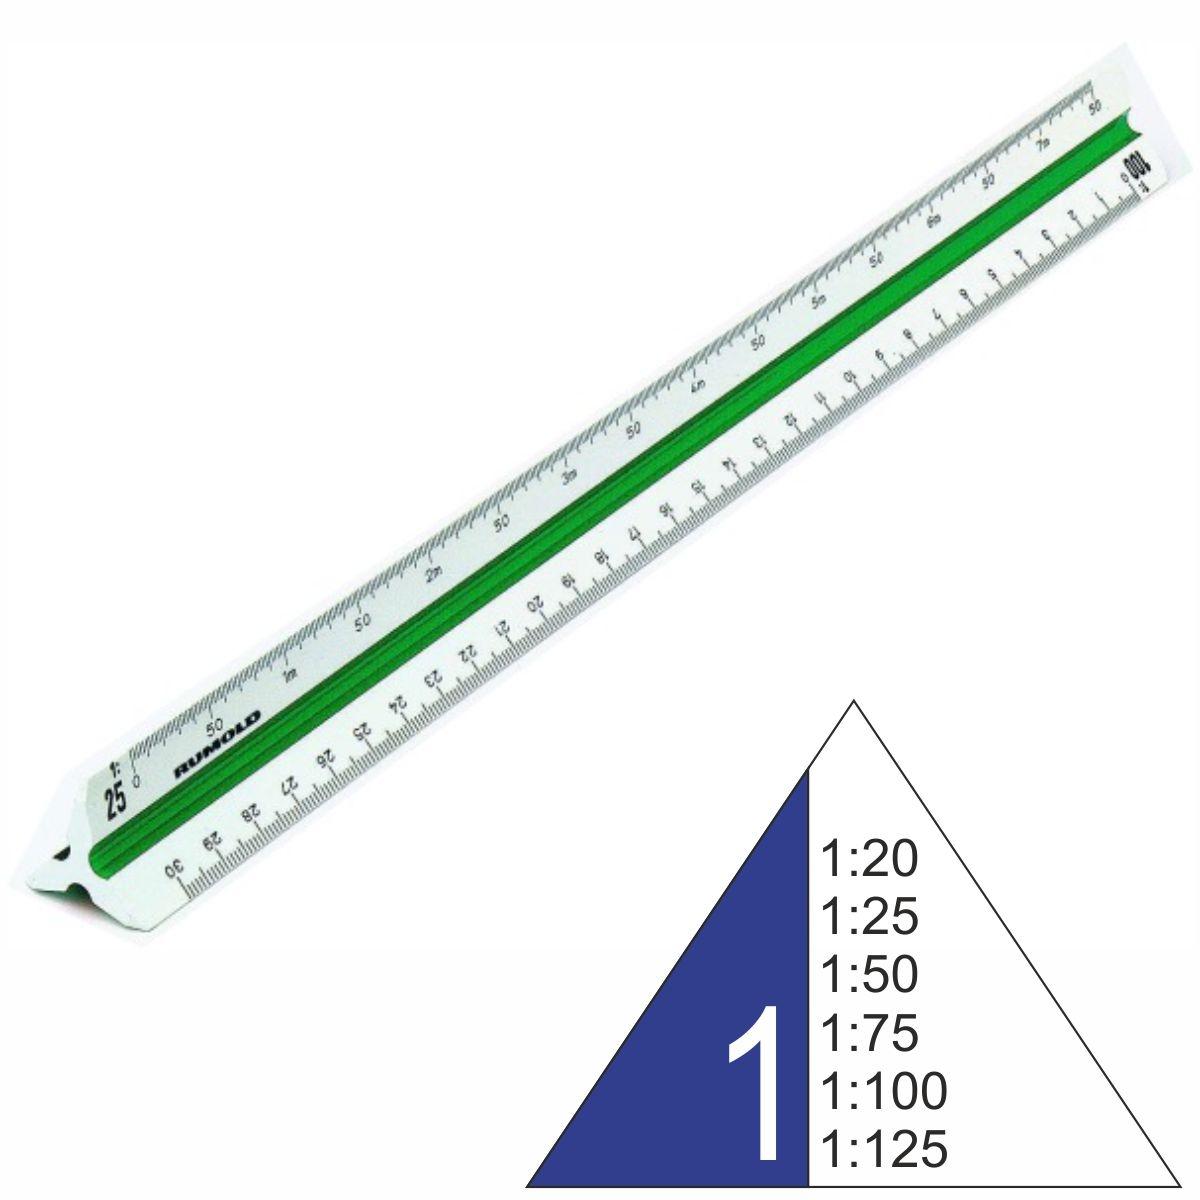 Dreikantmaßstab Dreiecklineal Maschinenbau Maßstab 1:20 bis 1:125 0231